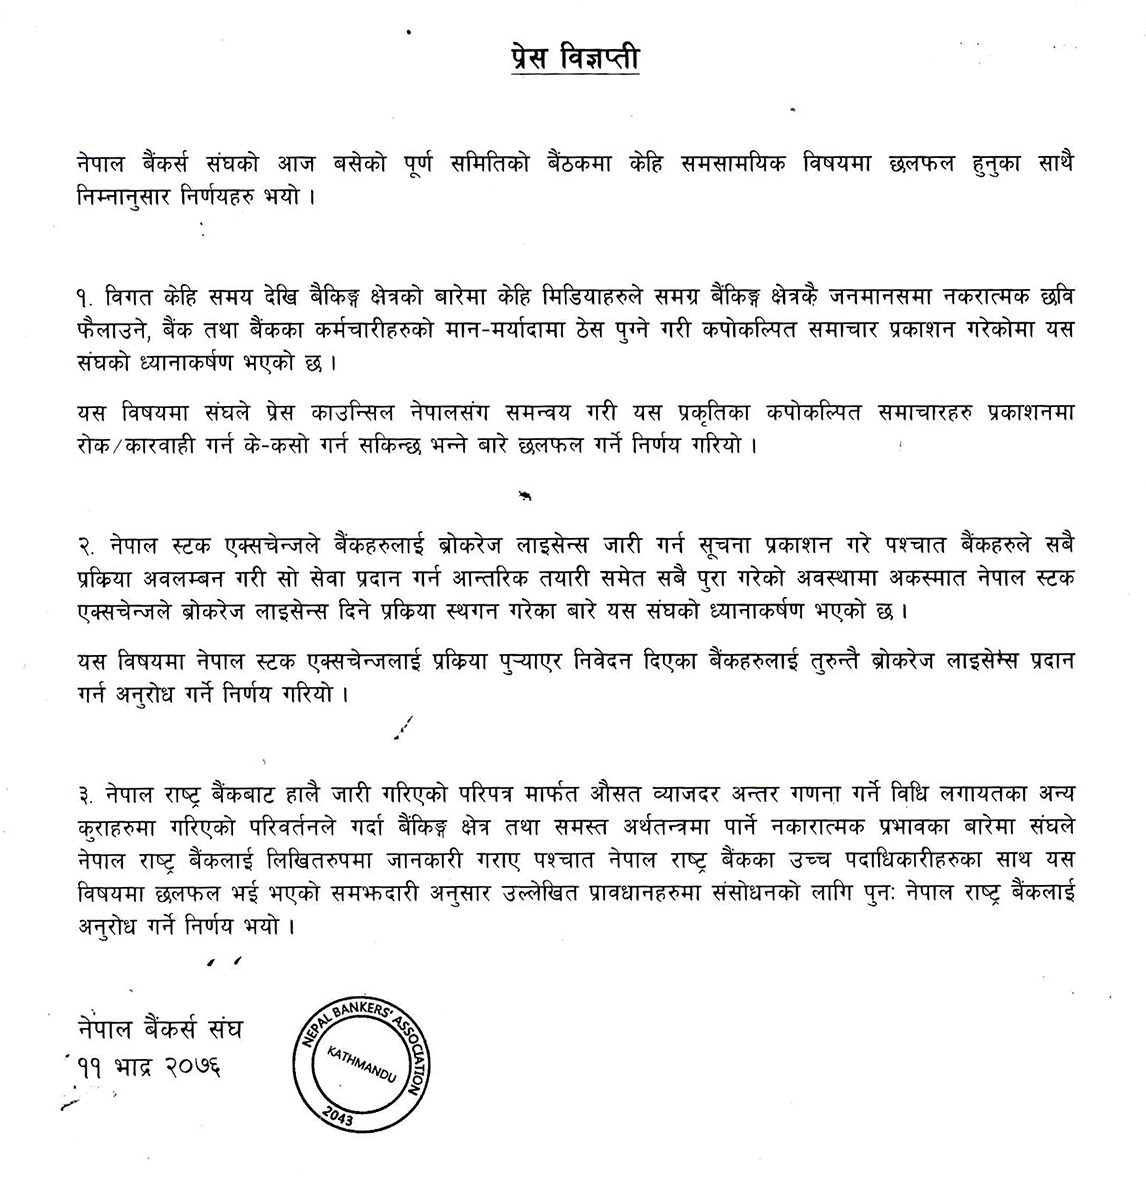 Press Release – Nepal Bankers' Association